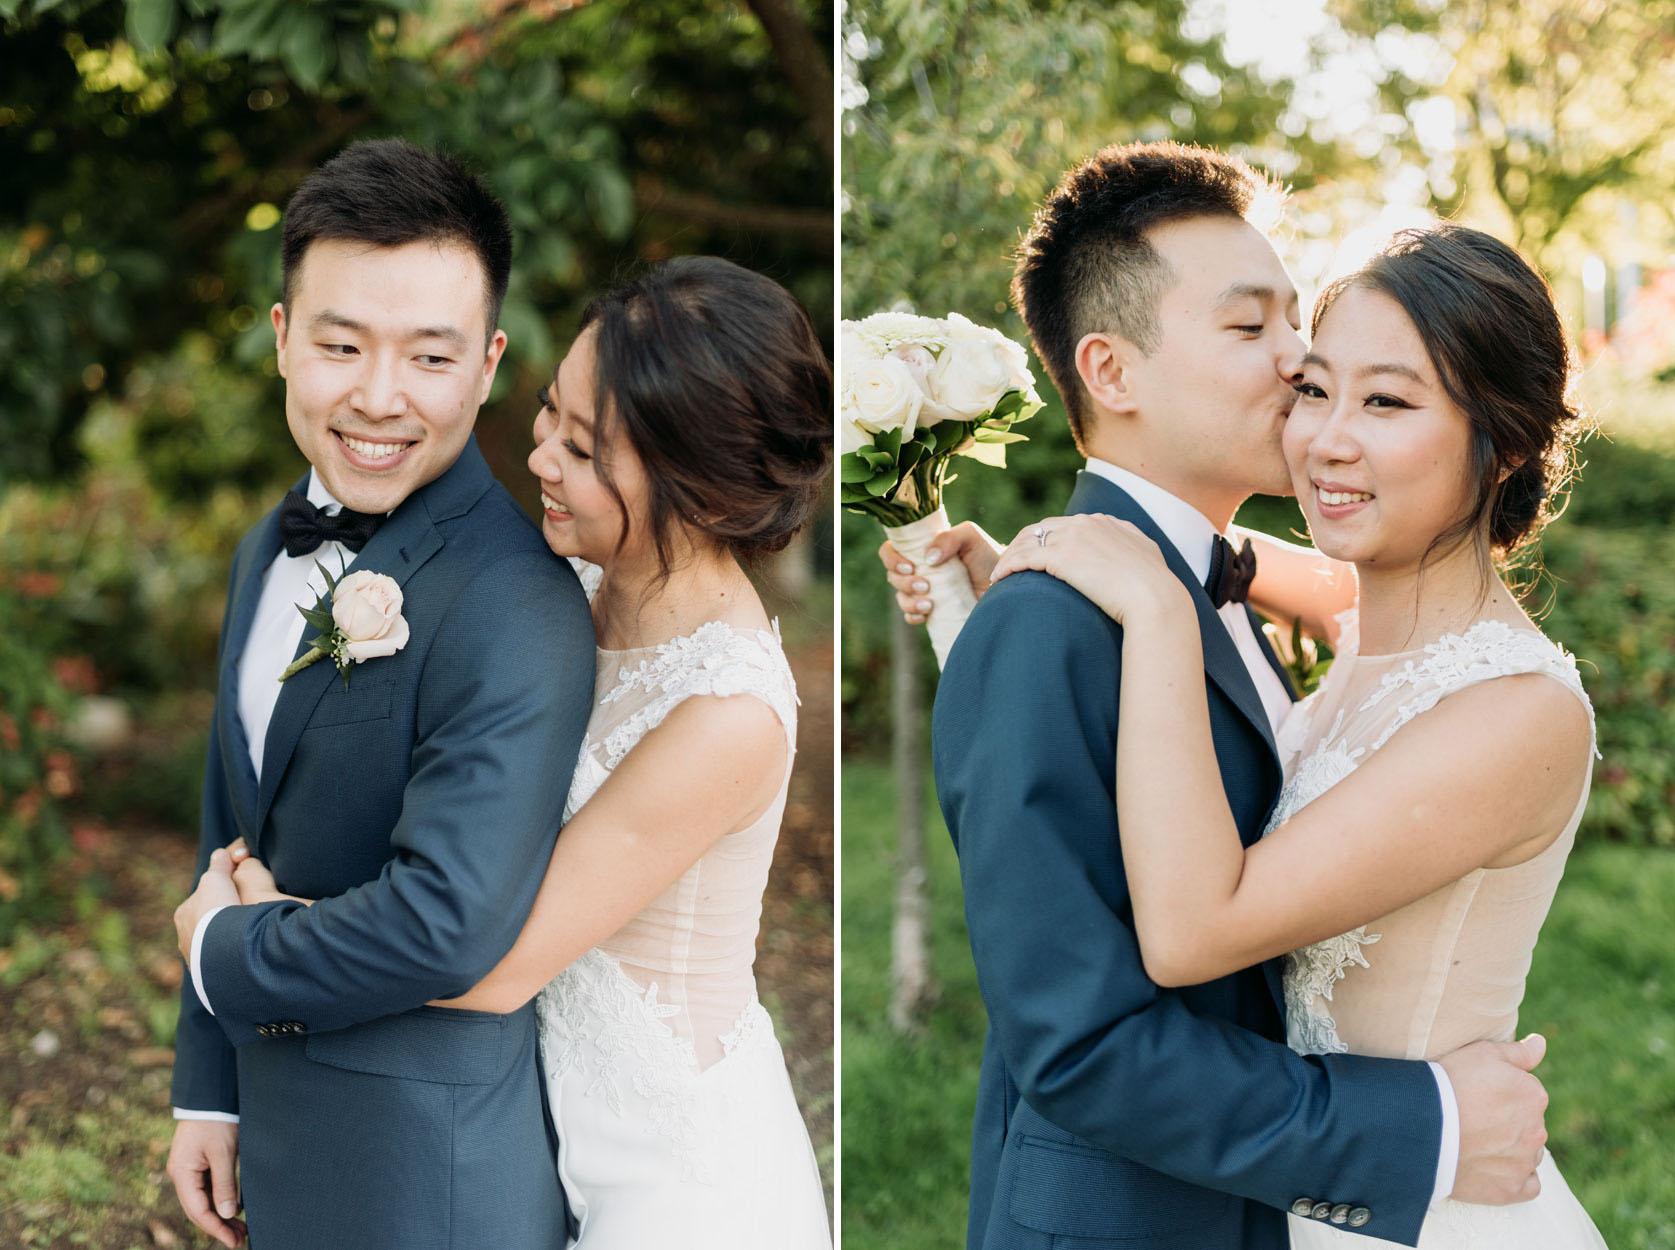 yaletown-wedding-34.jpg